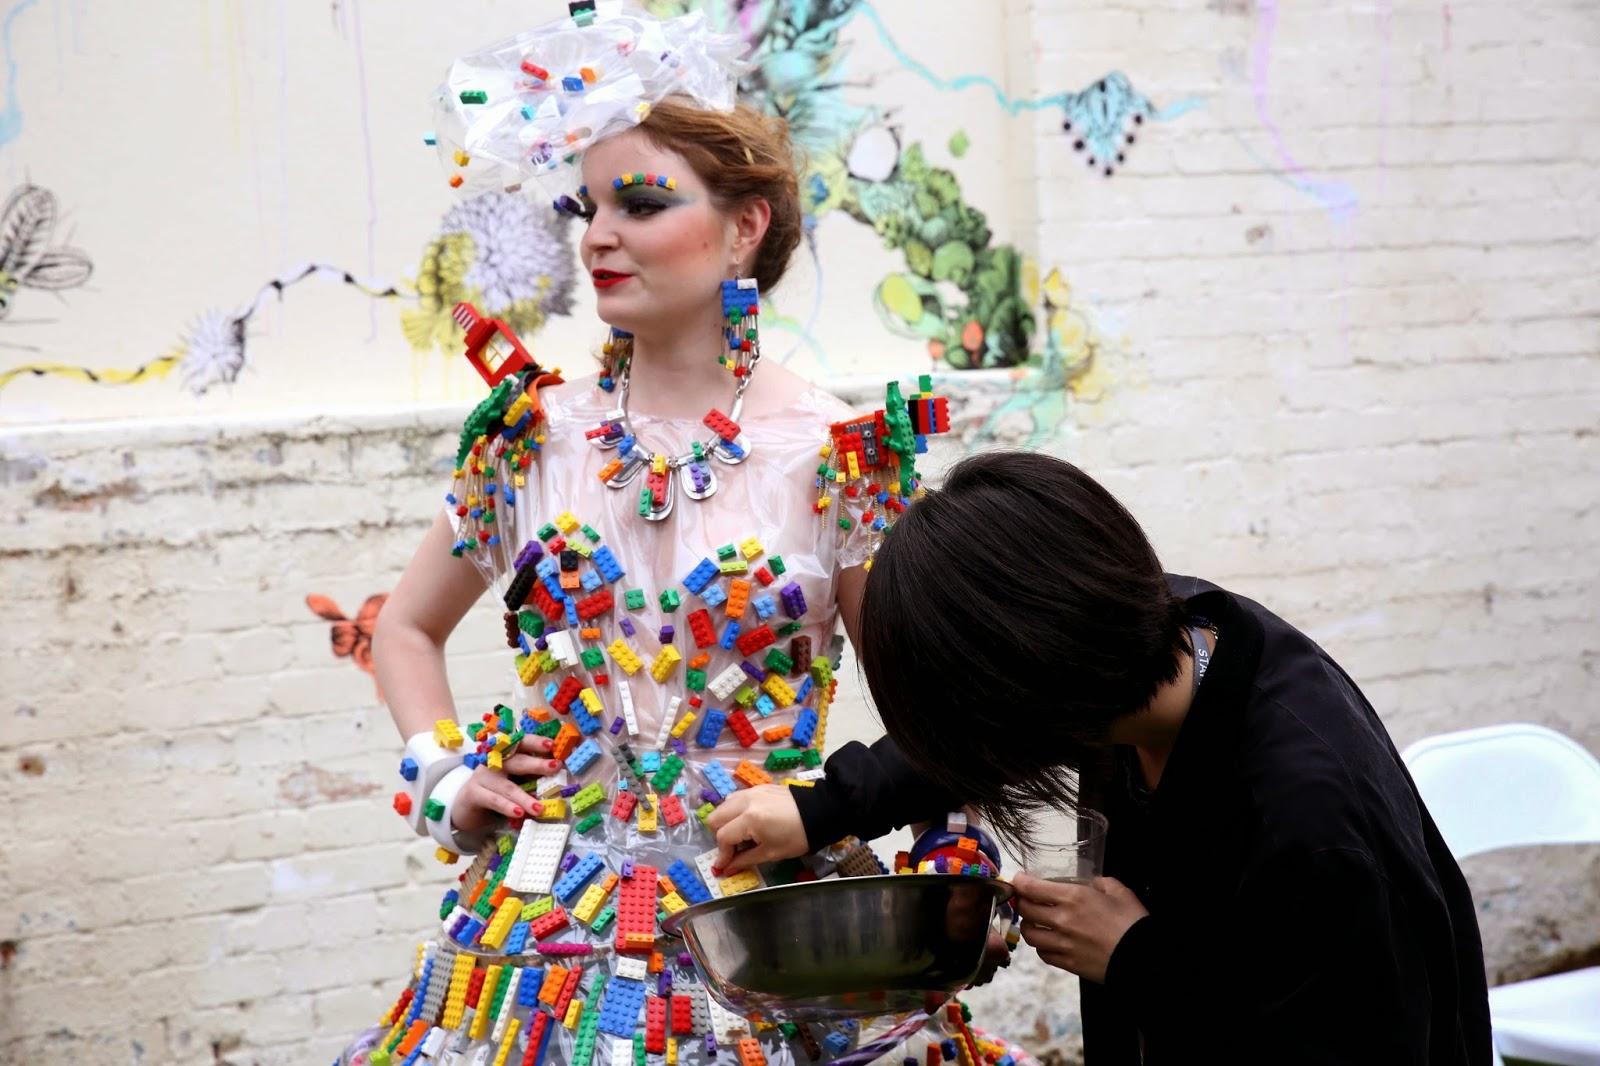 Lego dress- Barbican Ram place Festival